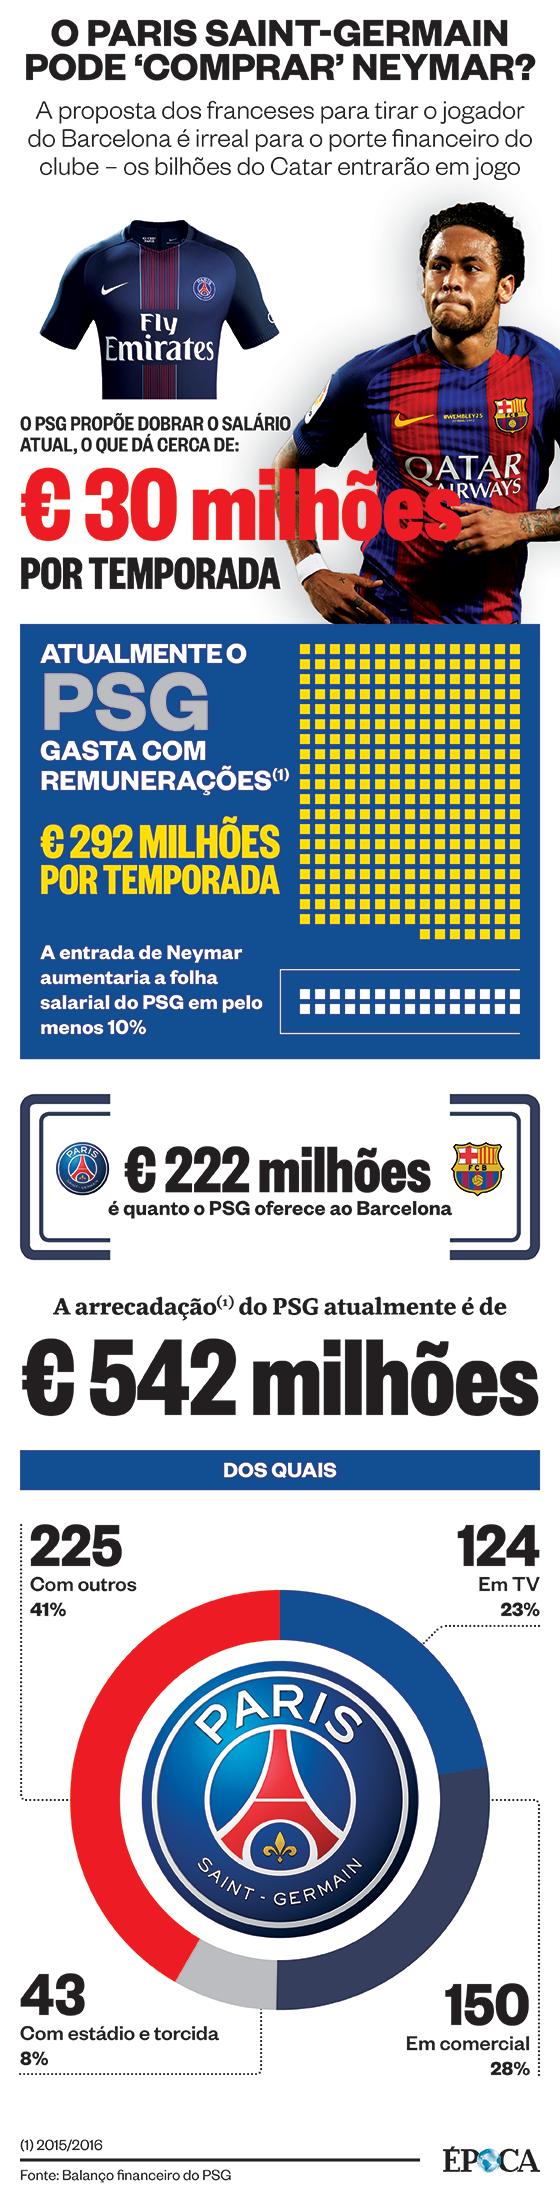 Neymar e PSG (Foto: ÉPOCA)